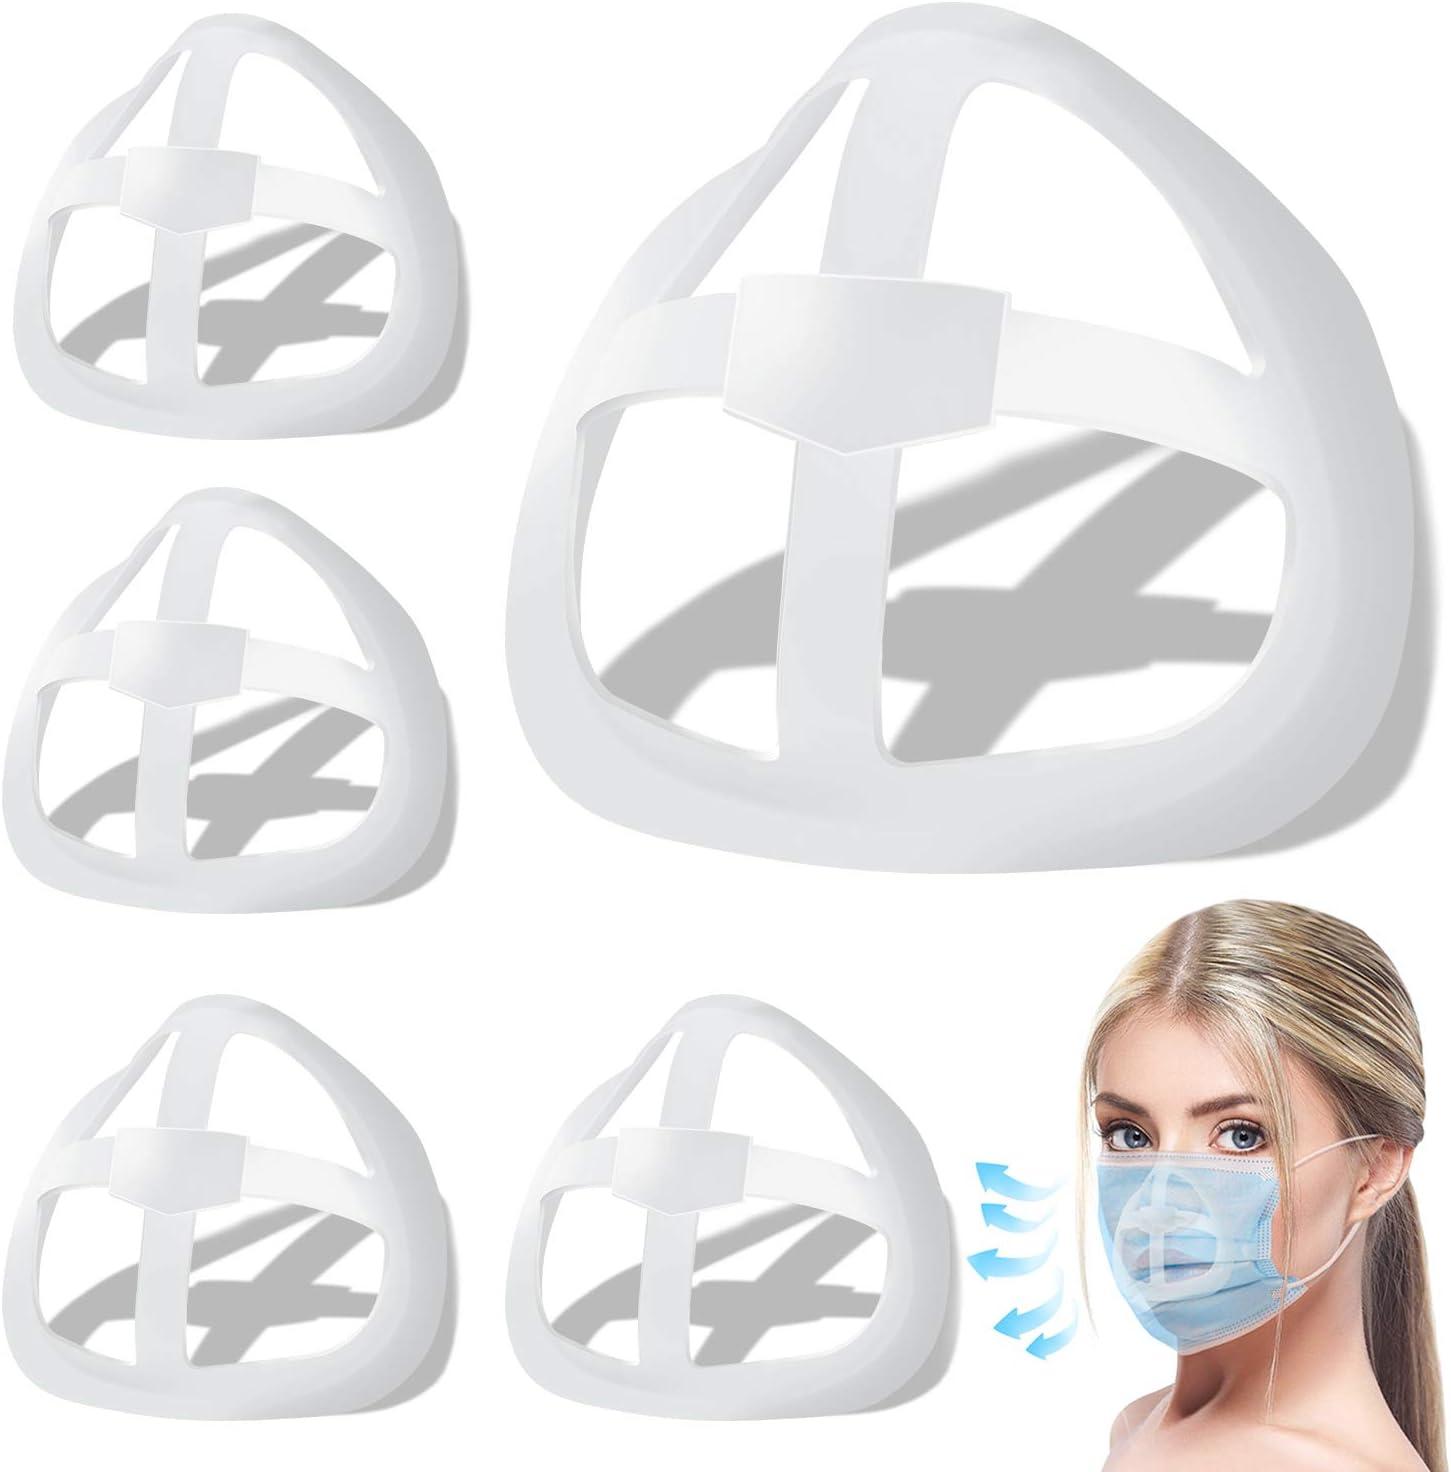 Du/šial 3D Bracket Comfort Breathable Reusable Silicone Face Inner Bracket Support Frame